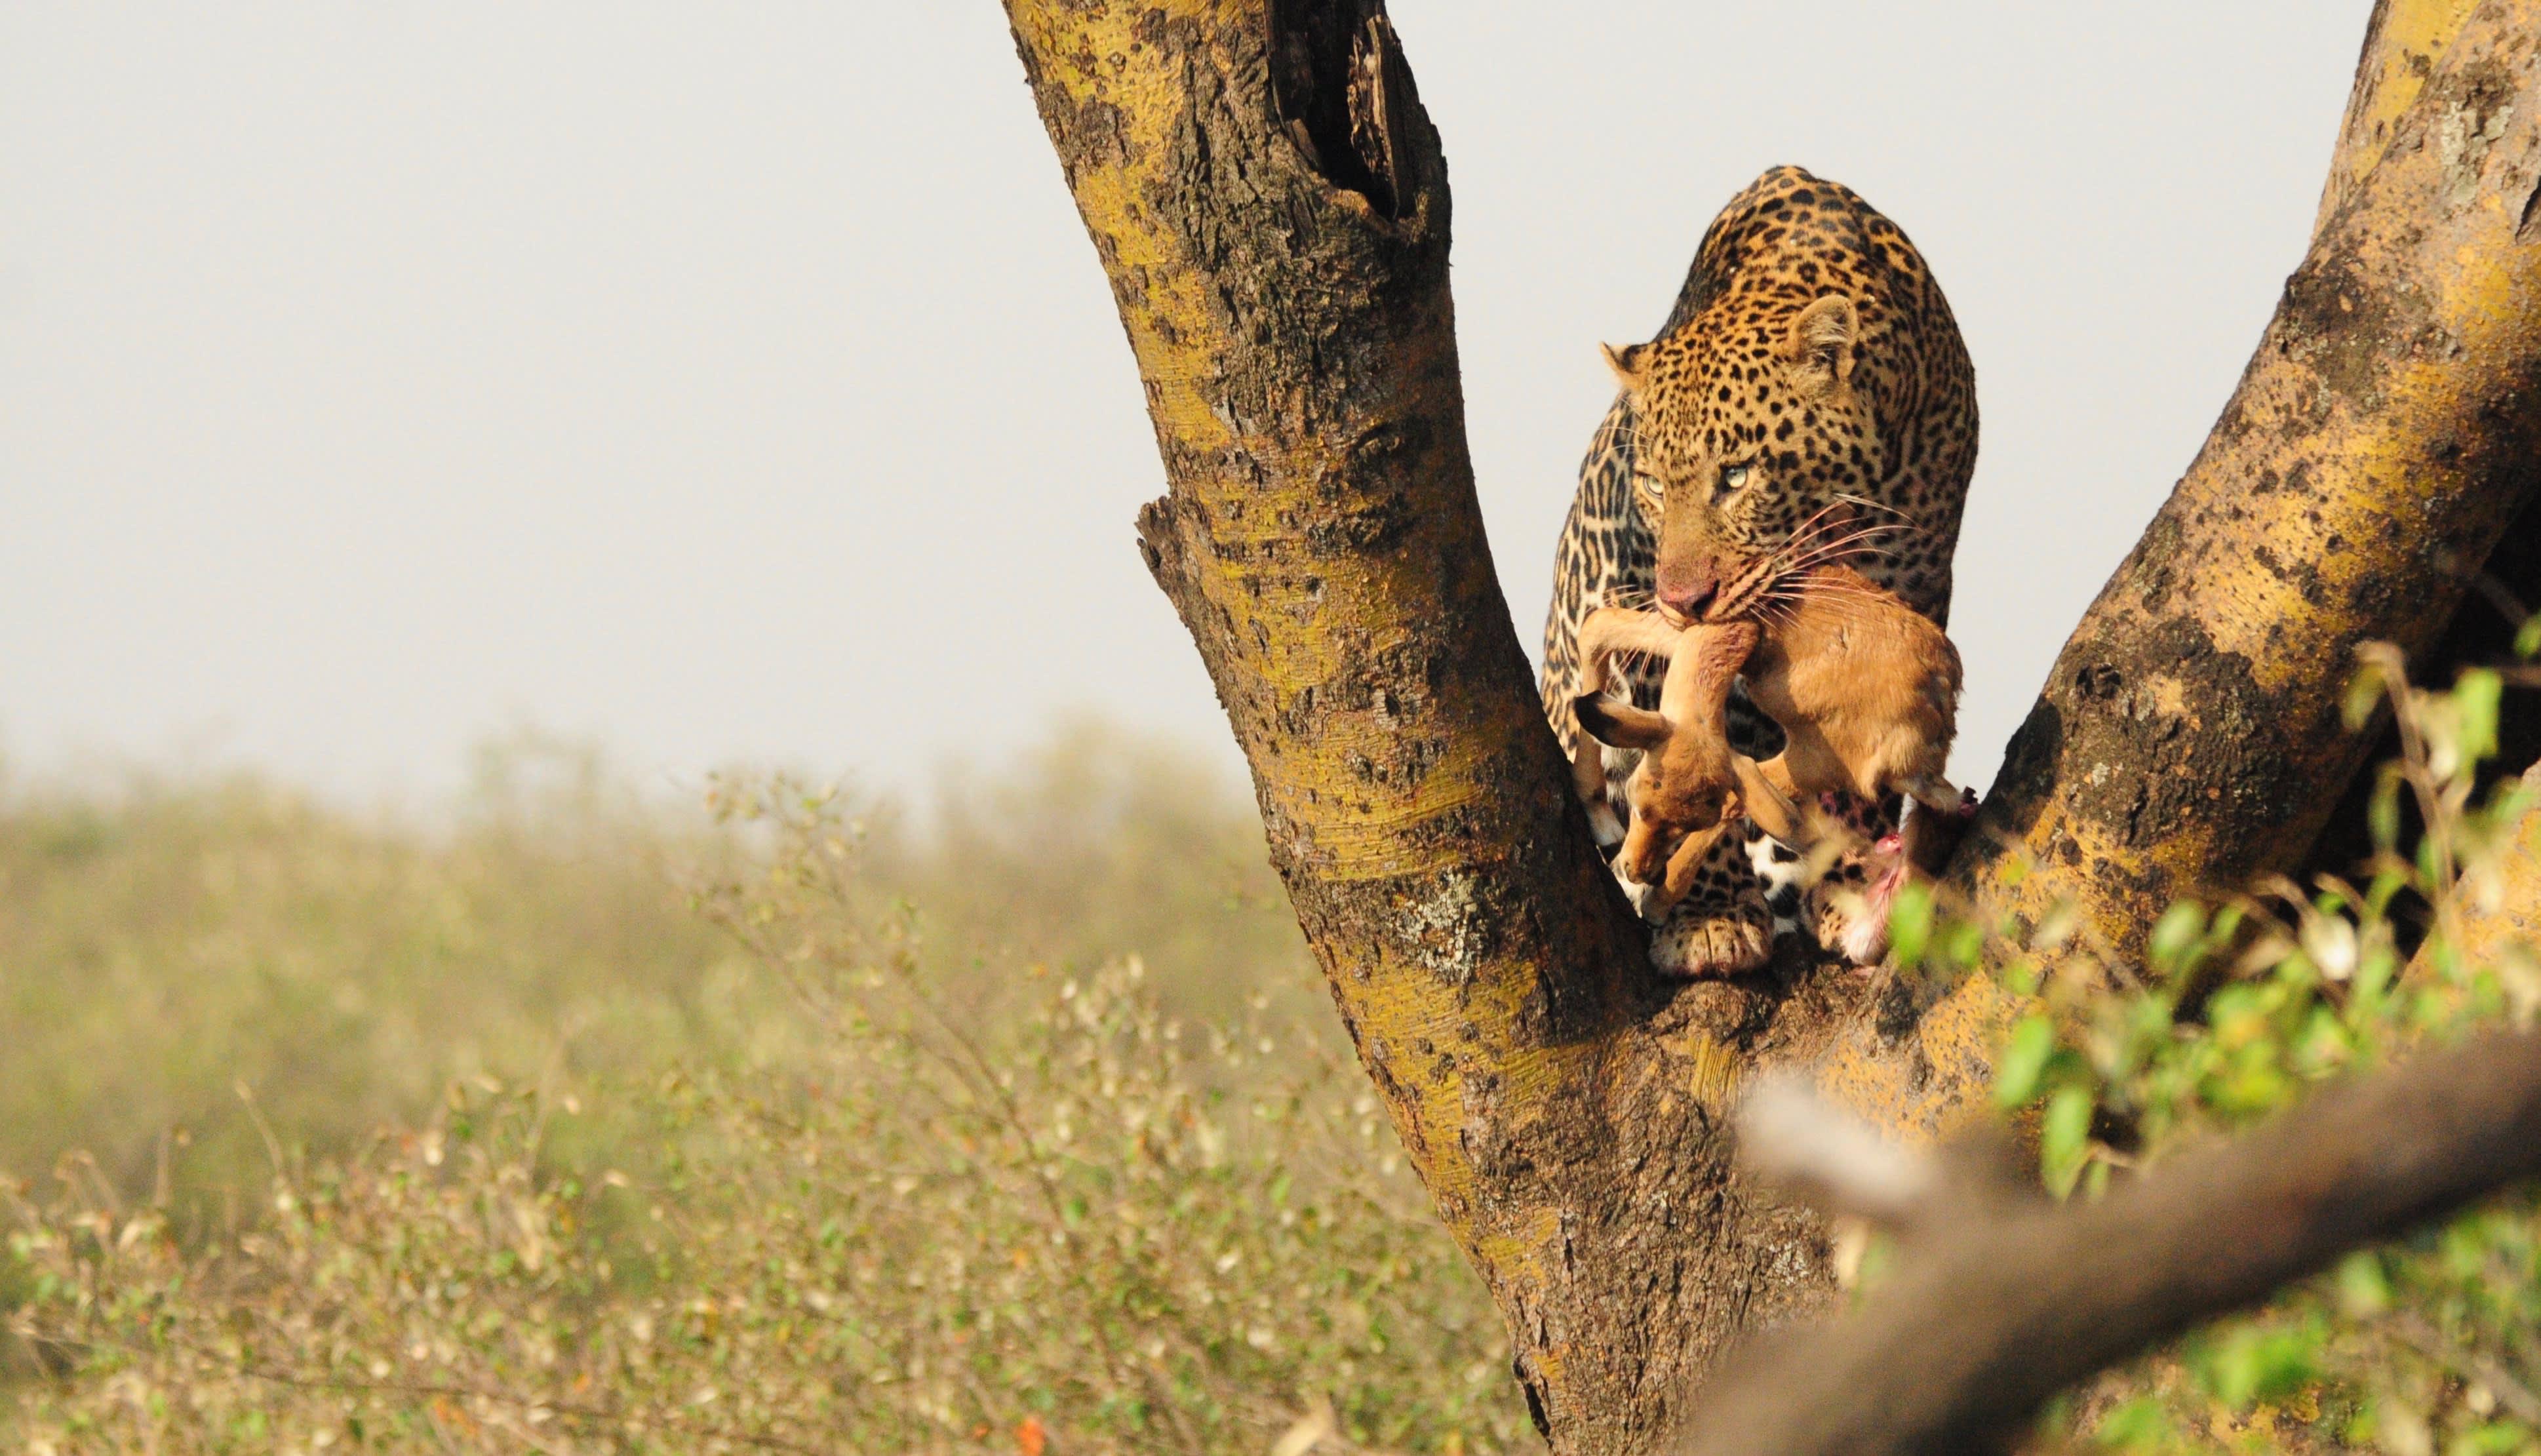 Leopard Snack